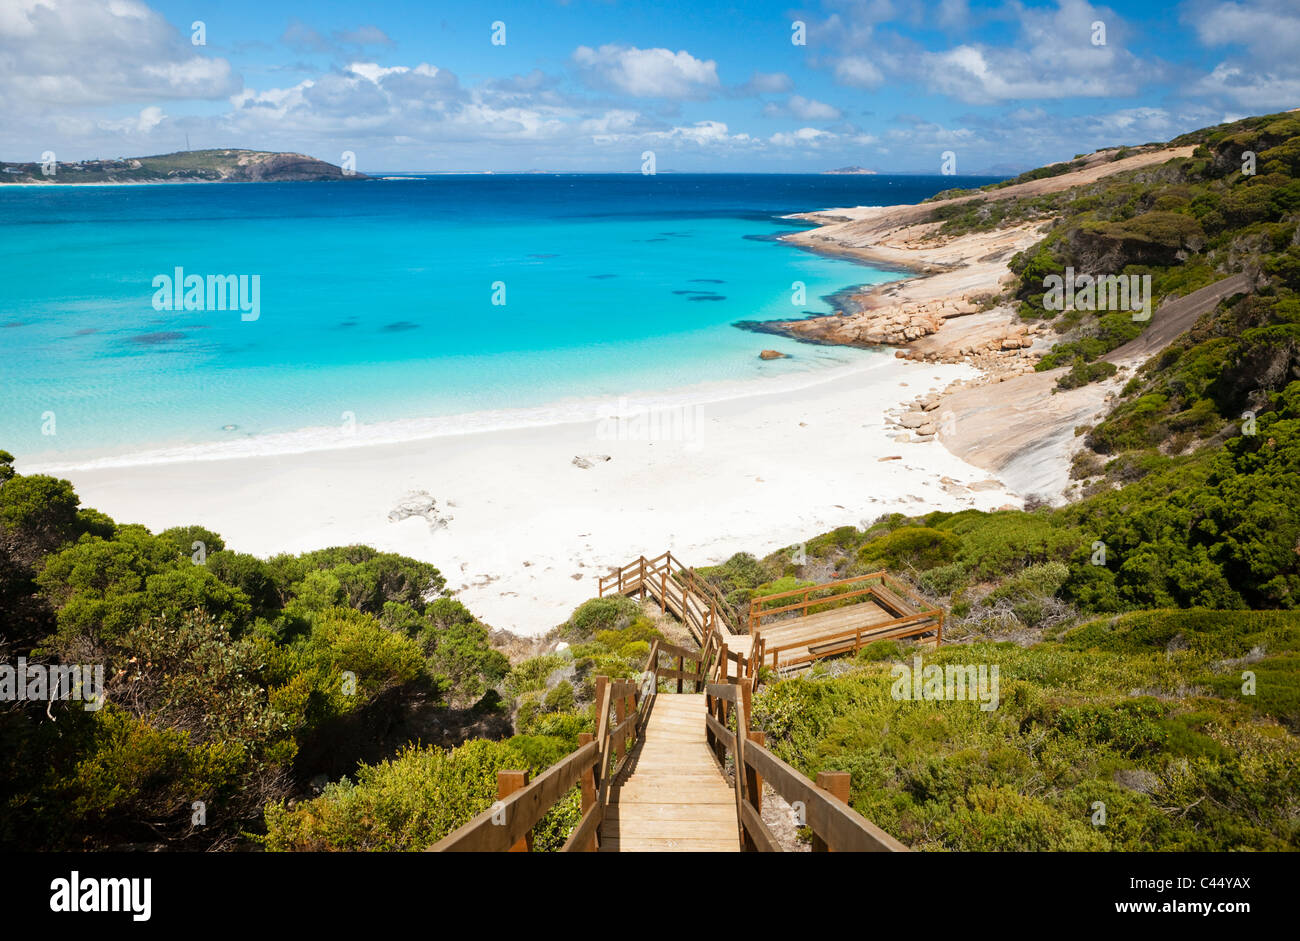 Hinunter zum Blue Haven Beach Boardwalk. Esperance, Western Australia, Australien Stockbild